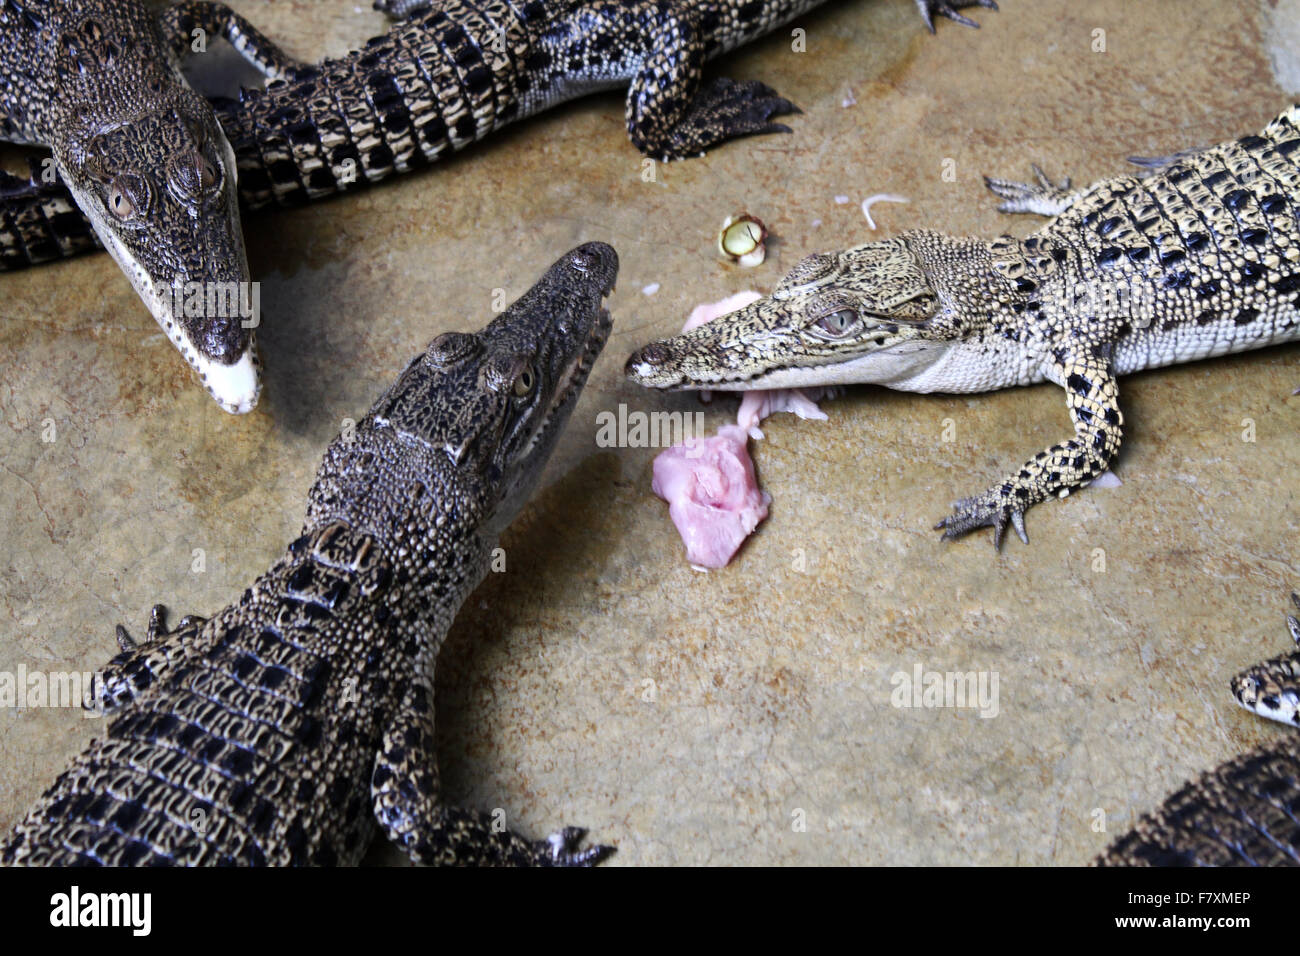 Crocodile newborn looks at mealtime at the crocodile farm in Medan, North Sumatra, Indonesia, December 3, 2015. - Stock Image